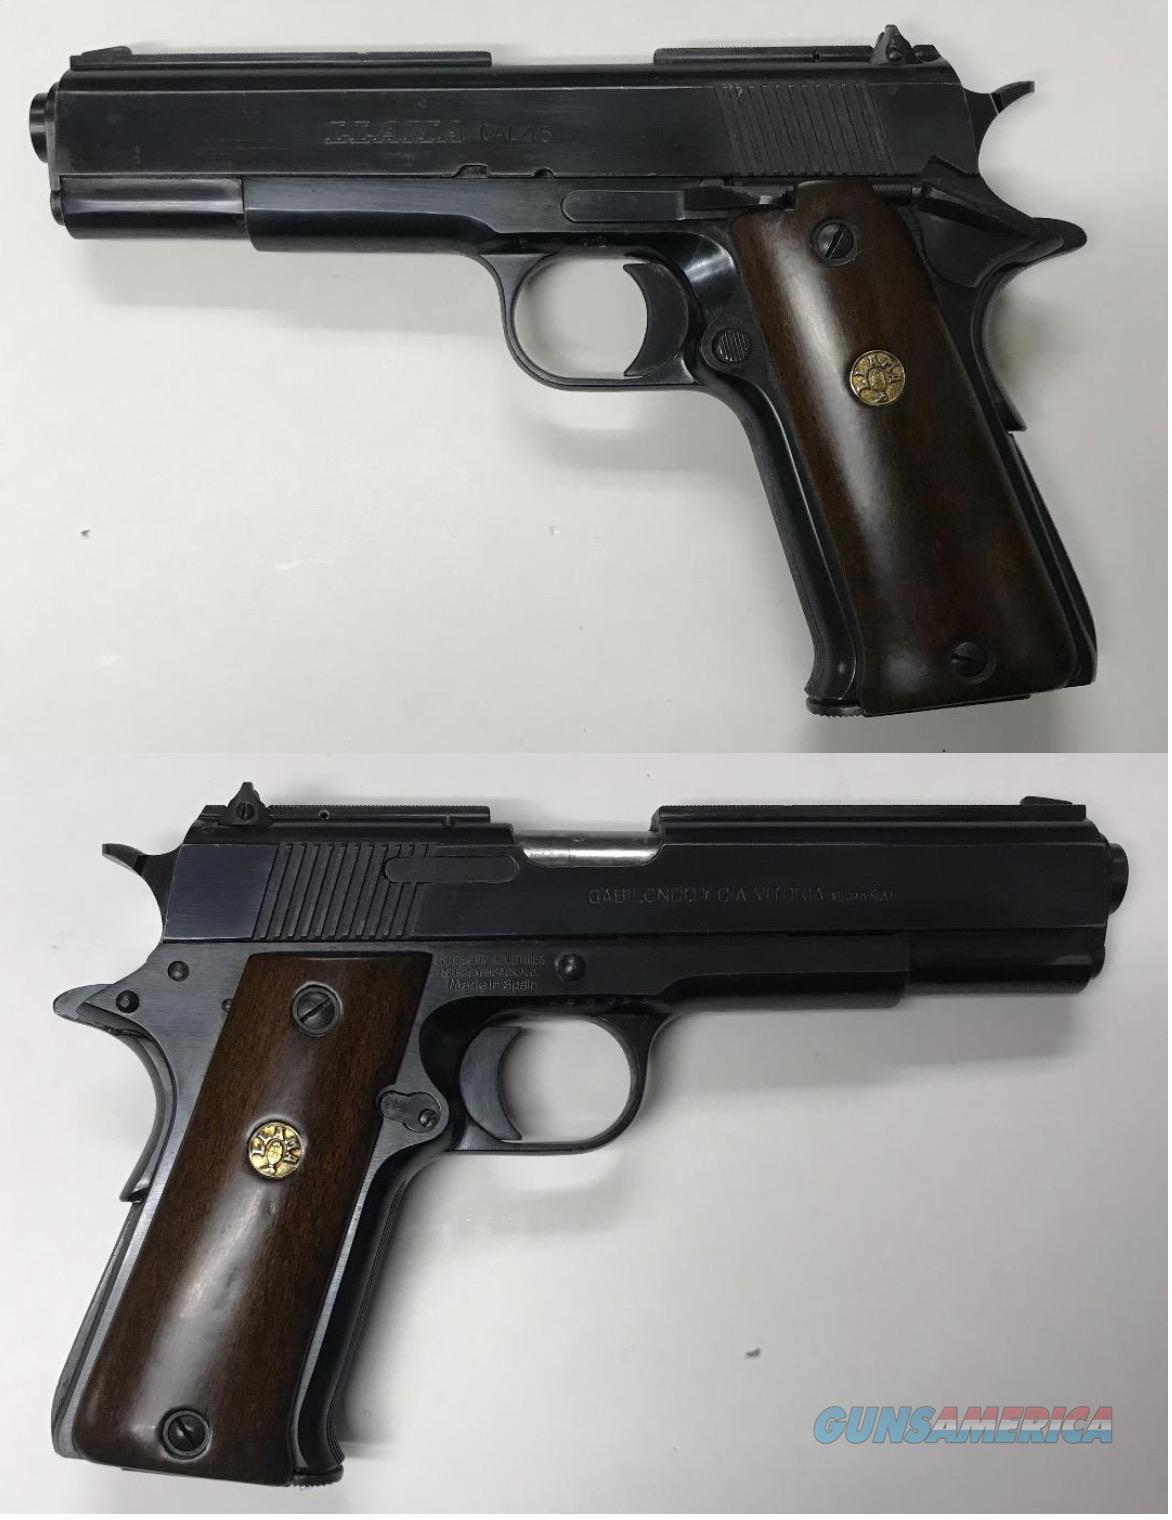 Llama 1911 style .45ACP  Guns > Pistols > 1911 Pistol Copies (non-Colt)